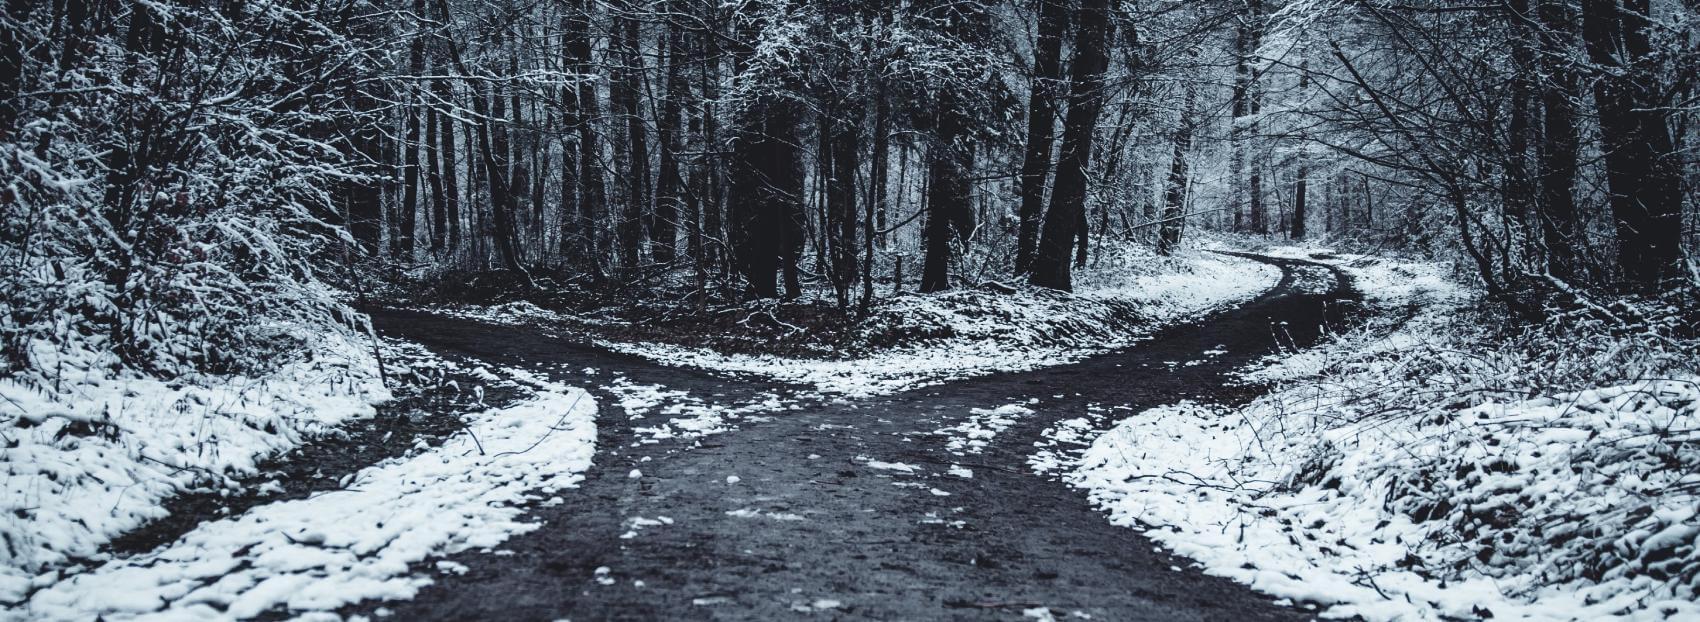 two paths banner - oliver-roos-571292-unsplash